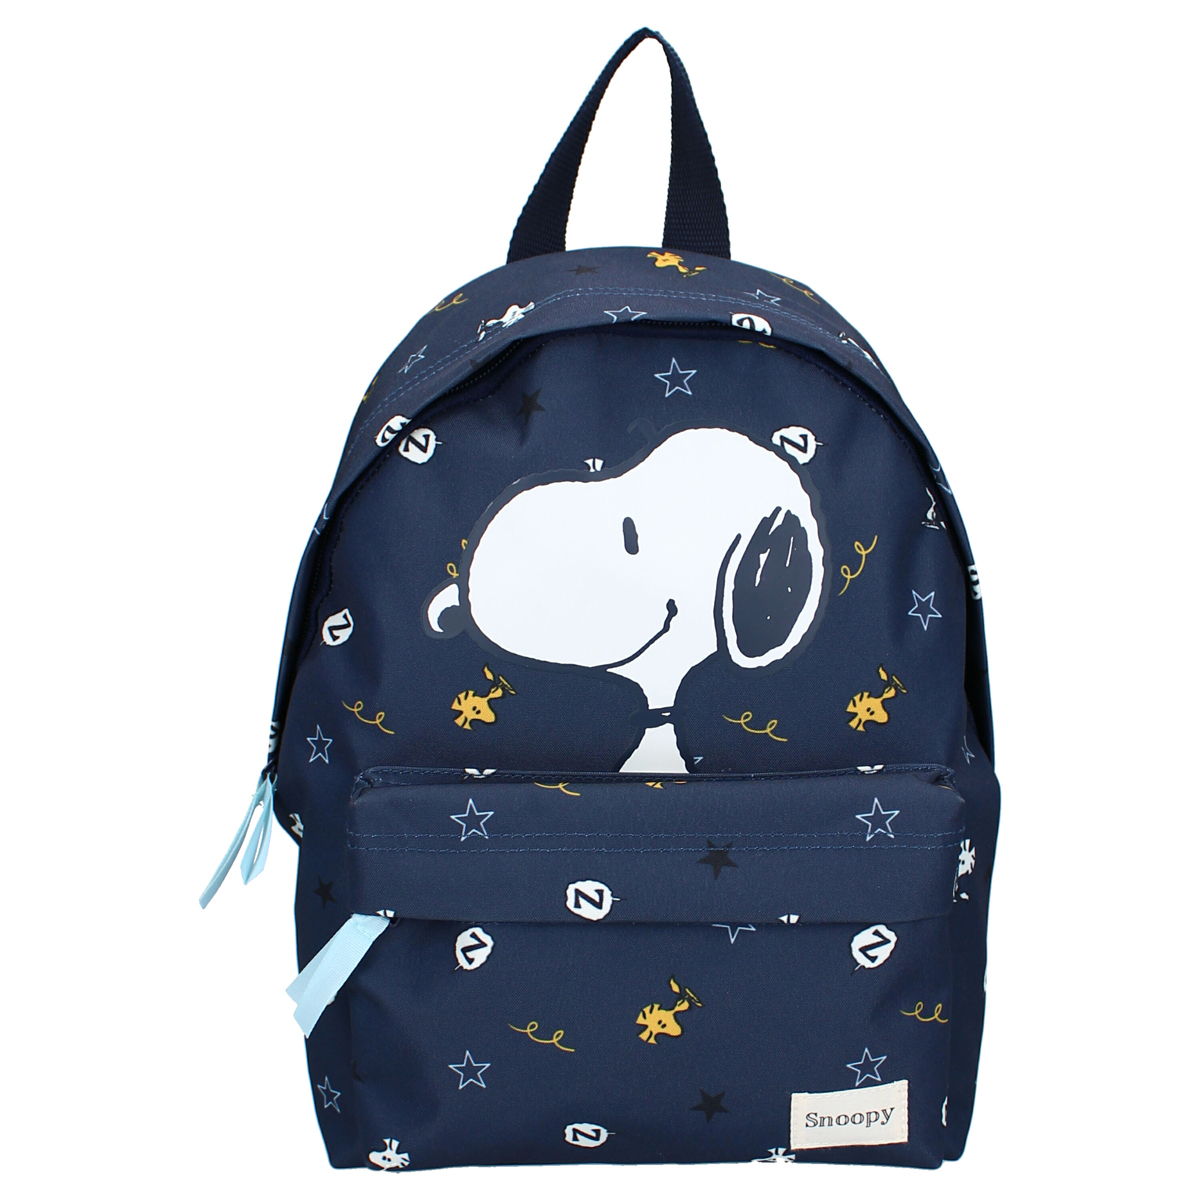 Sac à dos créateur \'Snoopy\' marine - 31x22x12 cm - [A3058]